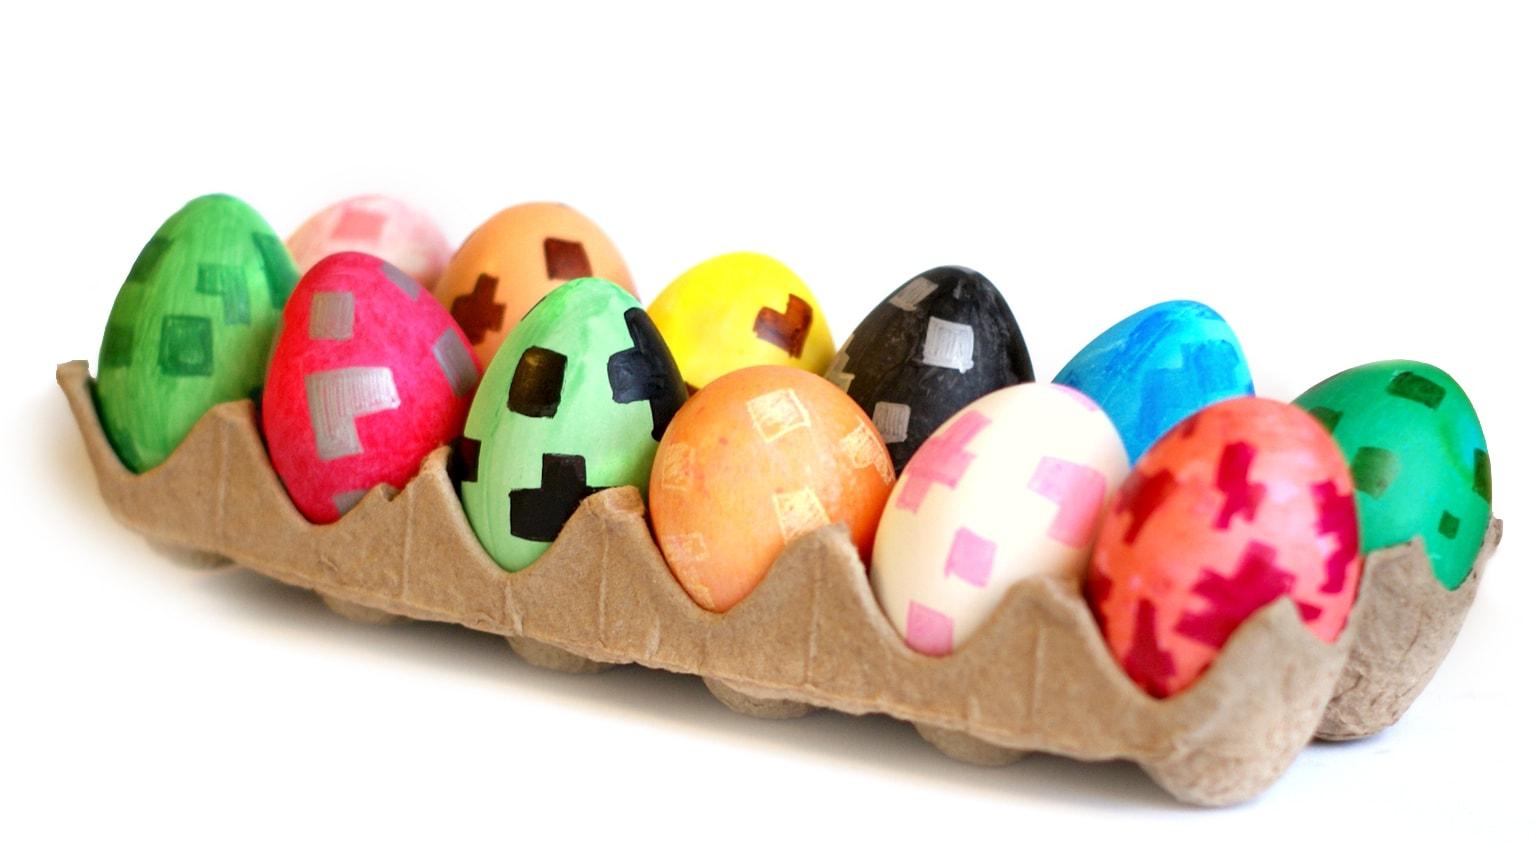 Plastic Minecraft hand painted eggs